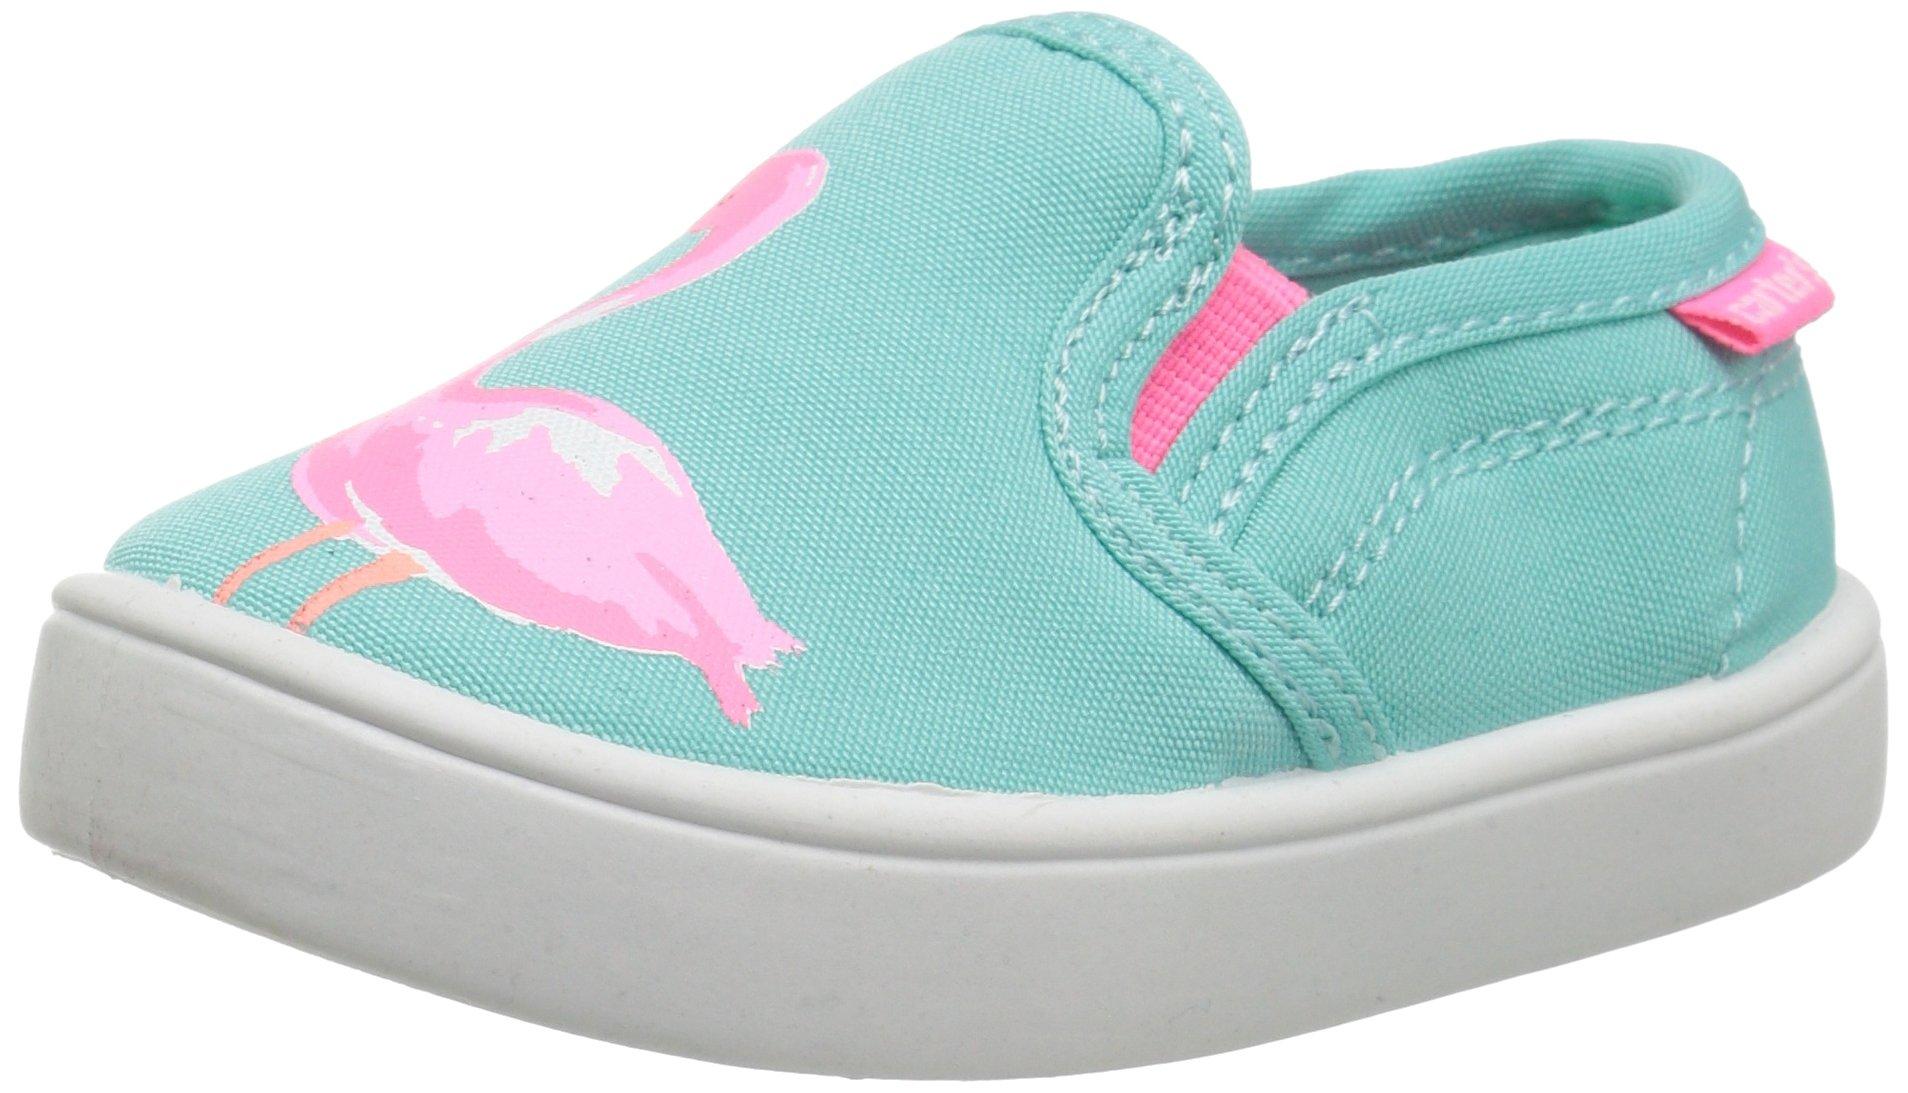 Carter's Tween Girl's Novelty Slip-On, Turquoise/Pink, 10 M US Toddler